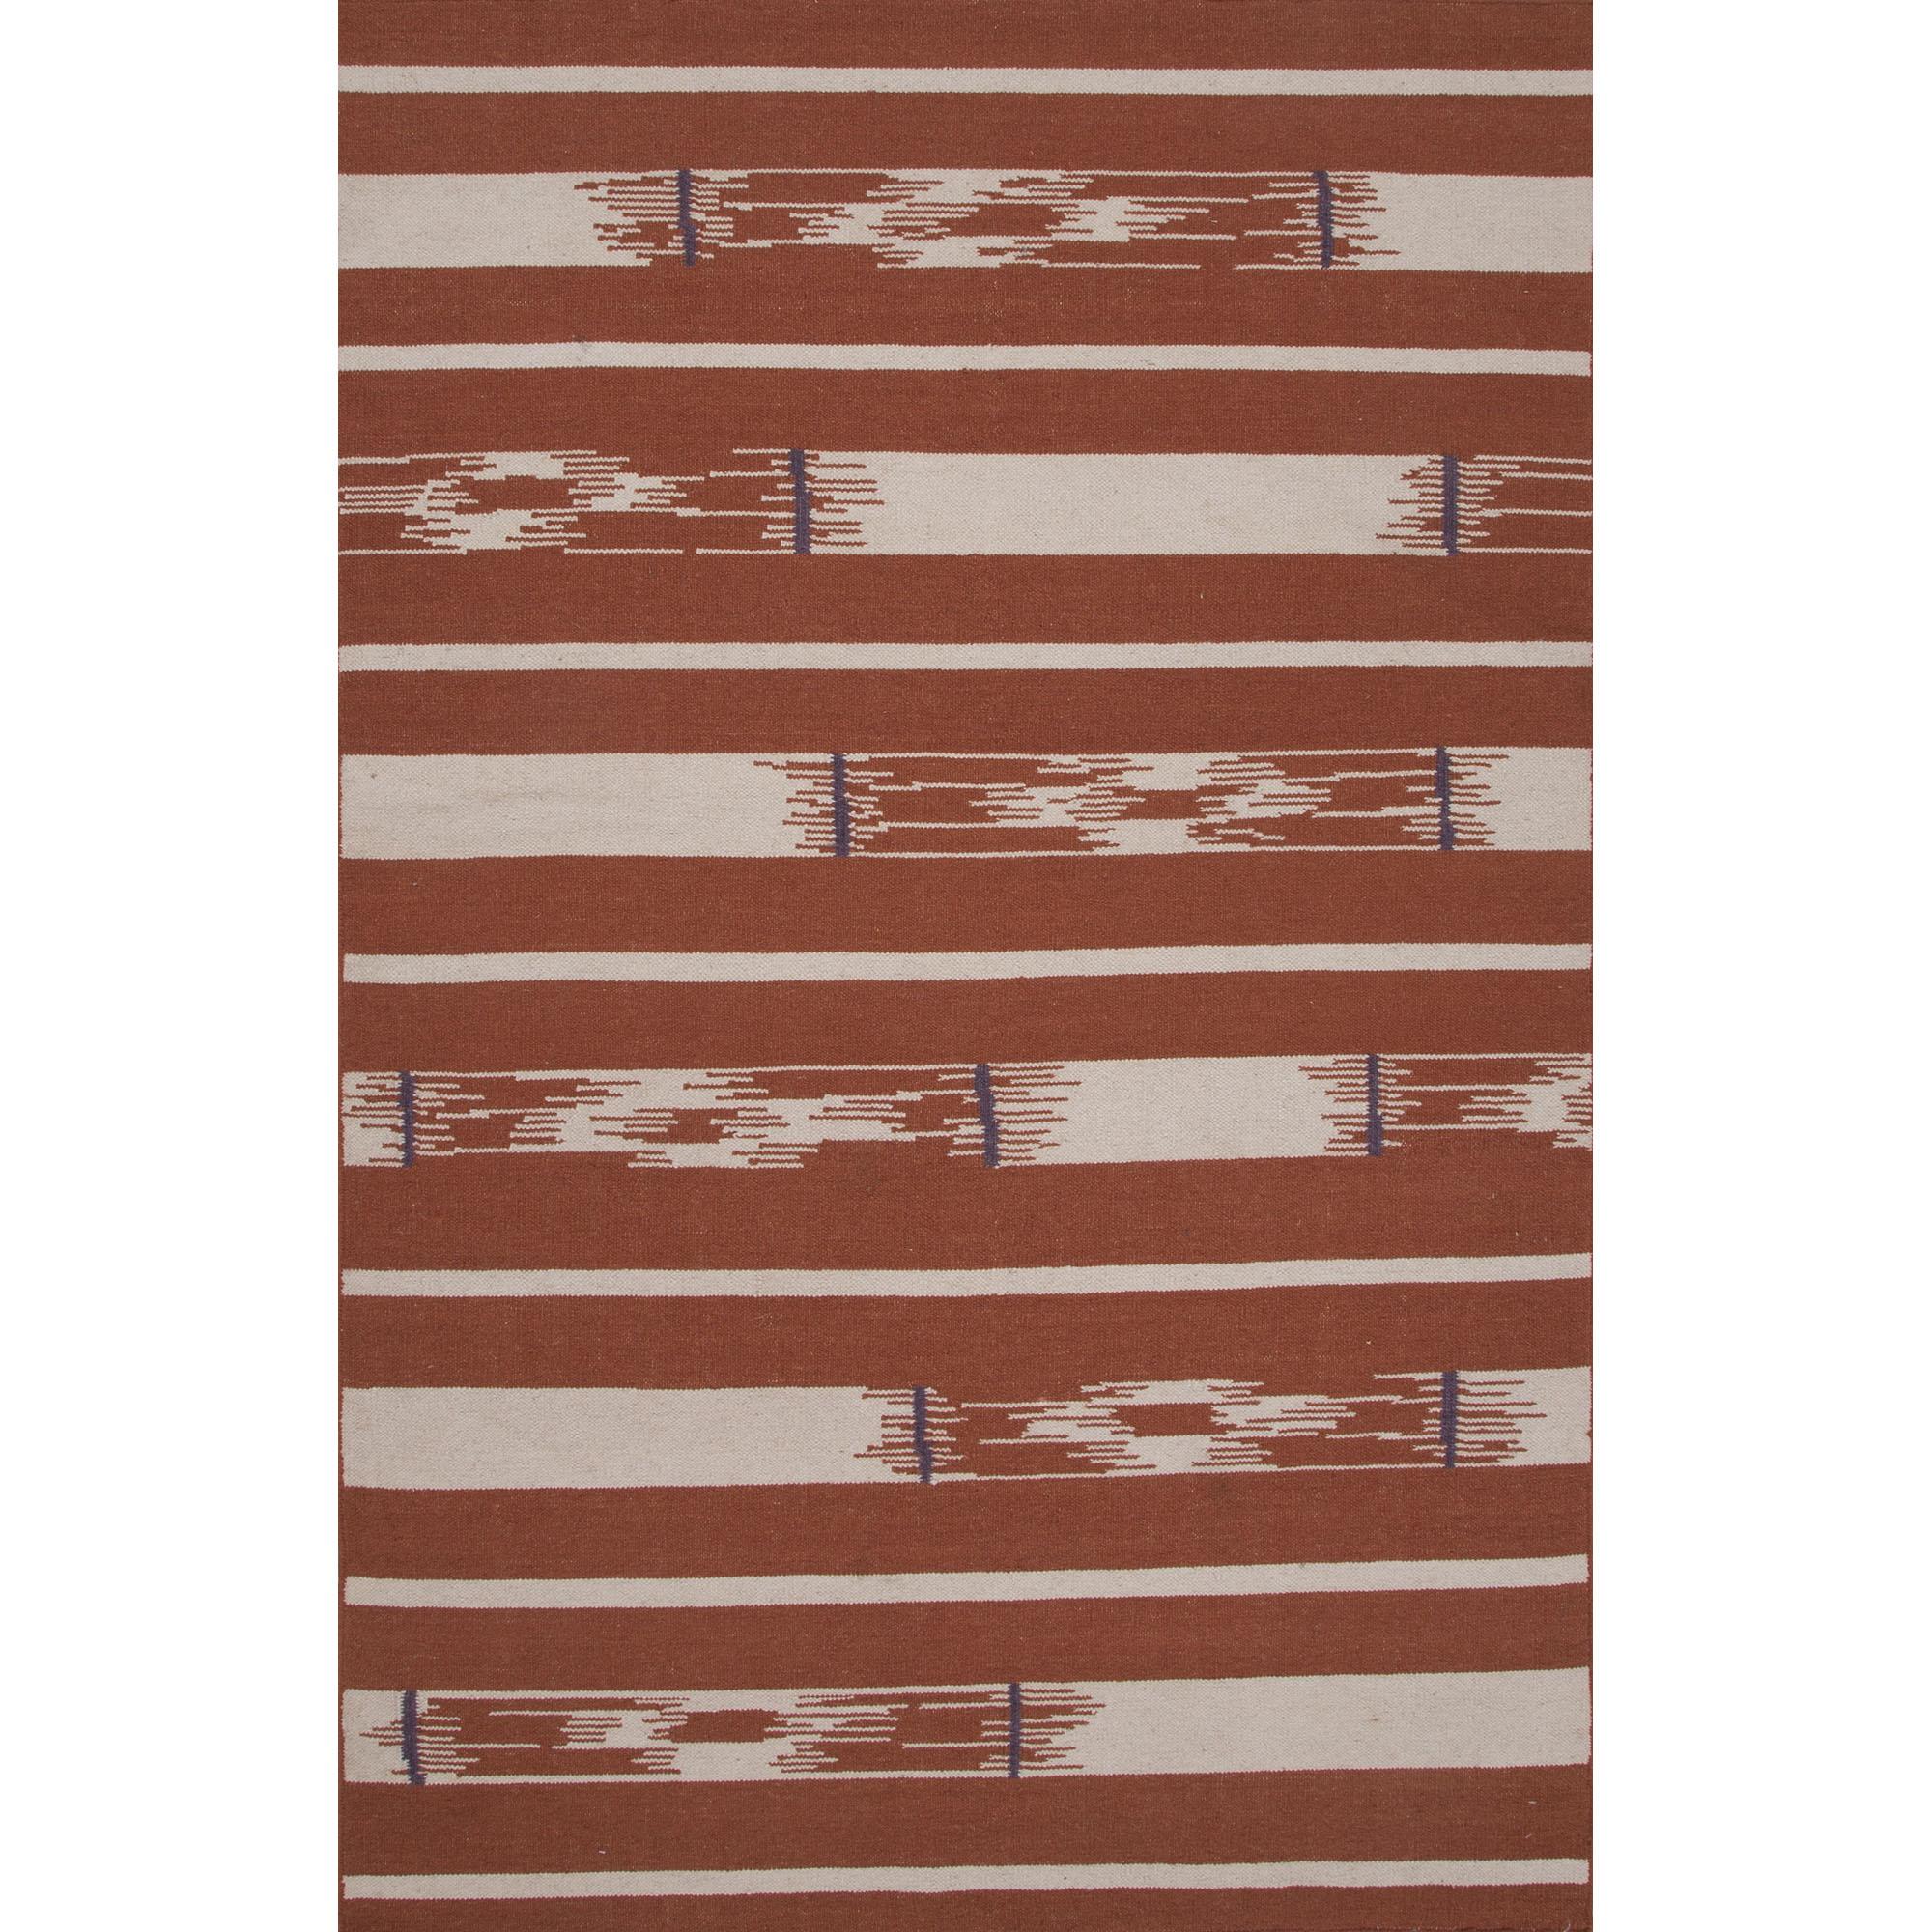 JAIPUR Rugs Traditions Modern Flat Weave 5 x 8 Rug - Item Number: RUG119847